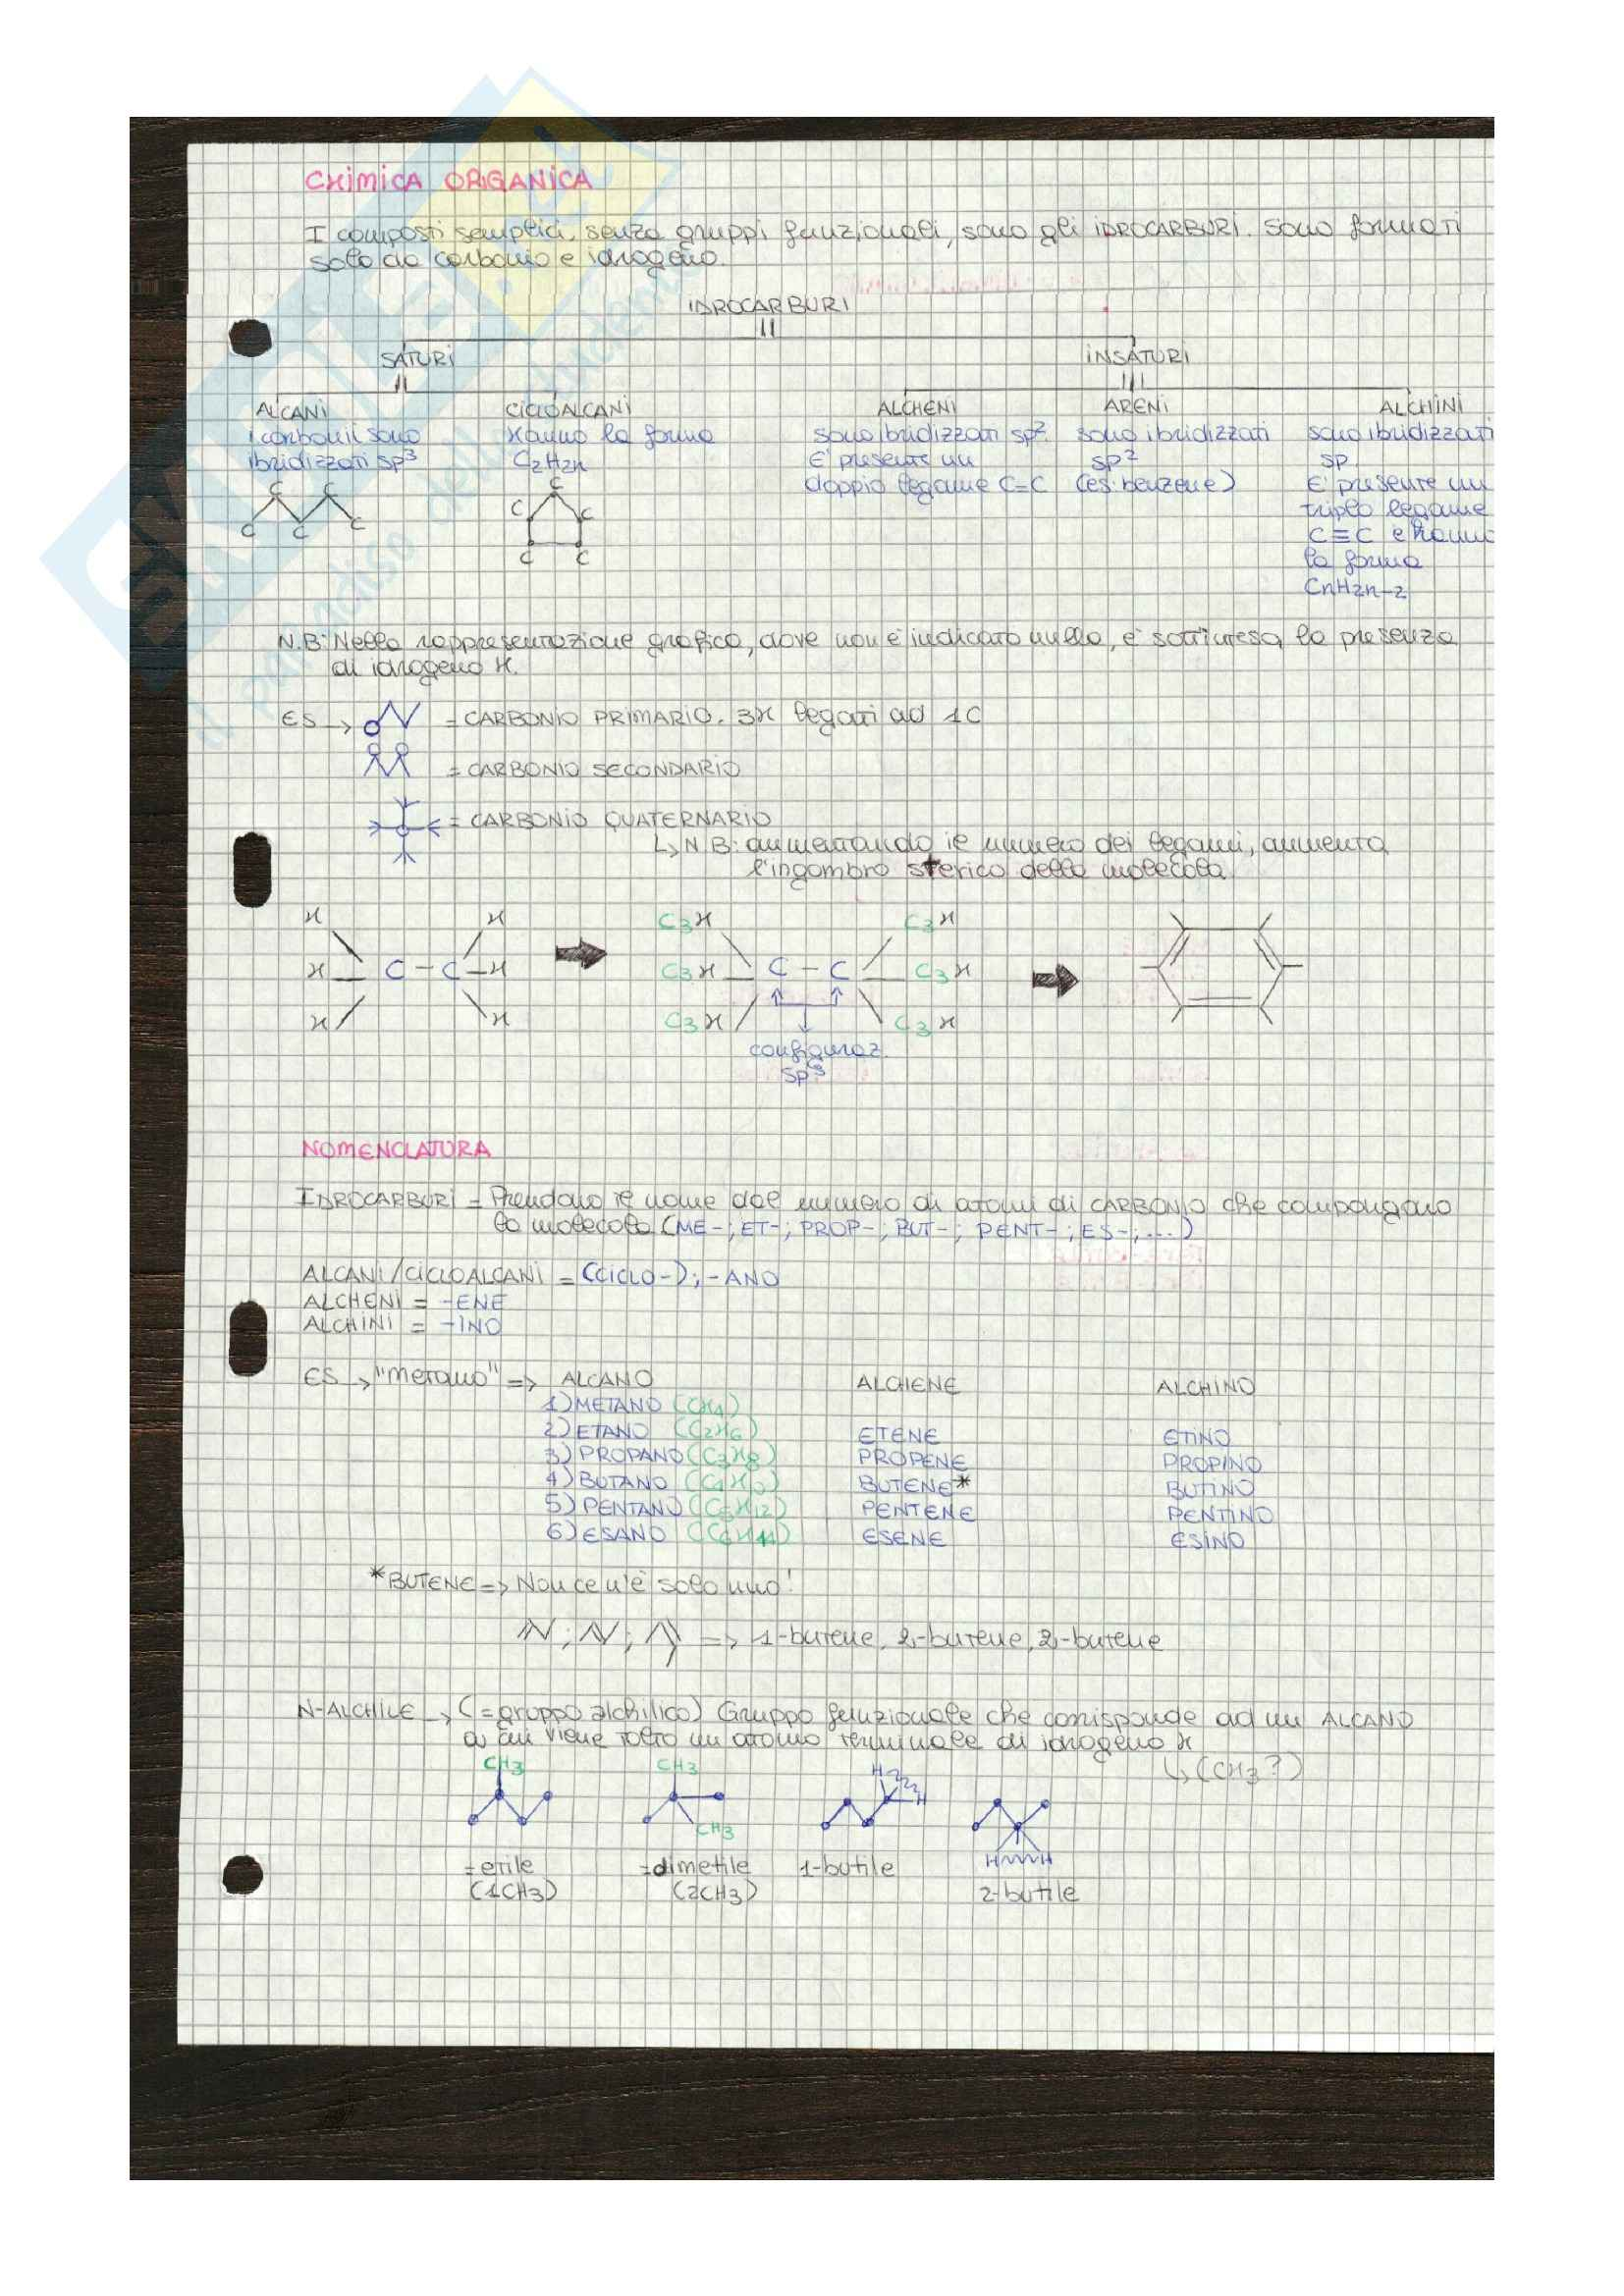 Fondamenti di chimica organica - alcani e nomenclatura